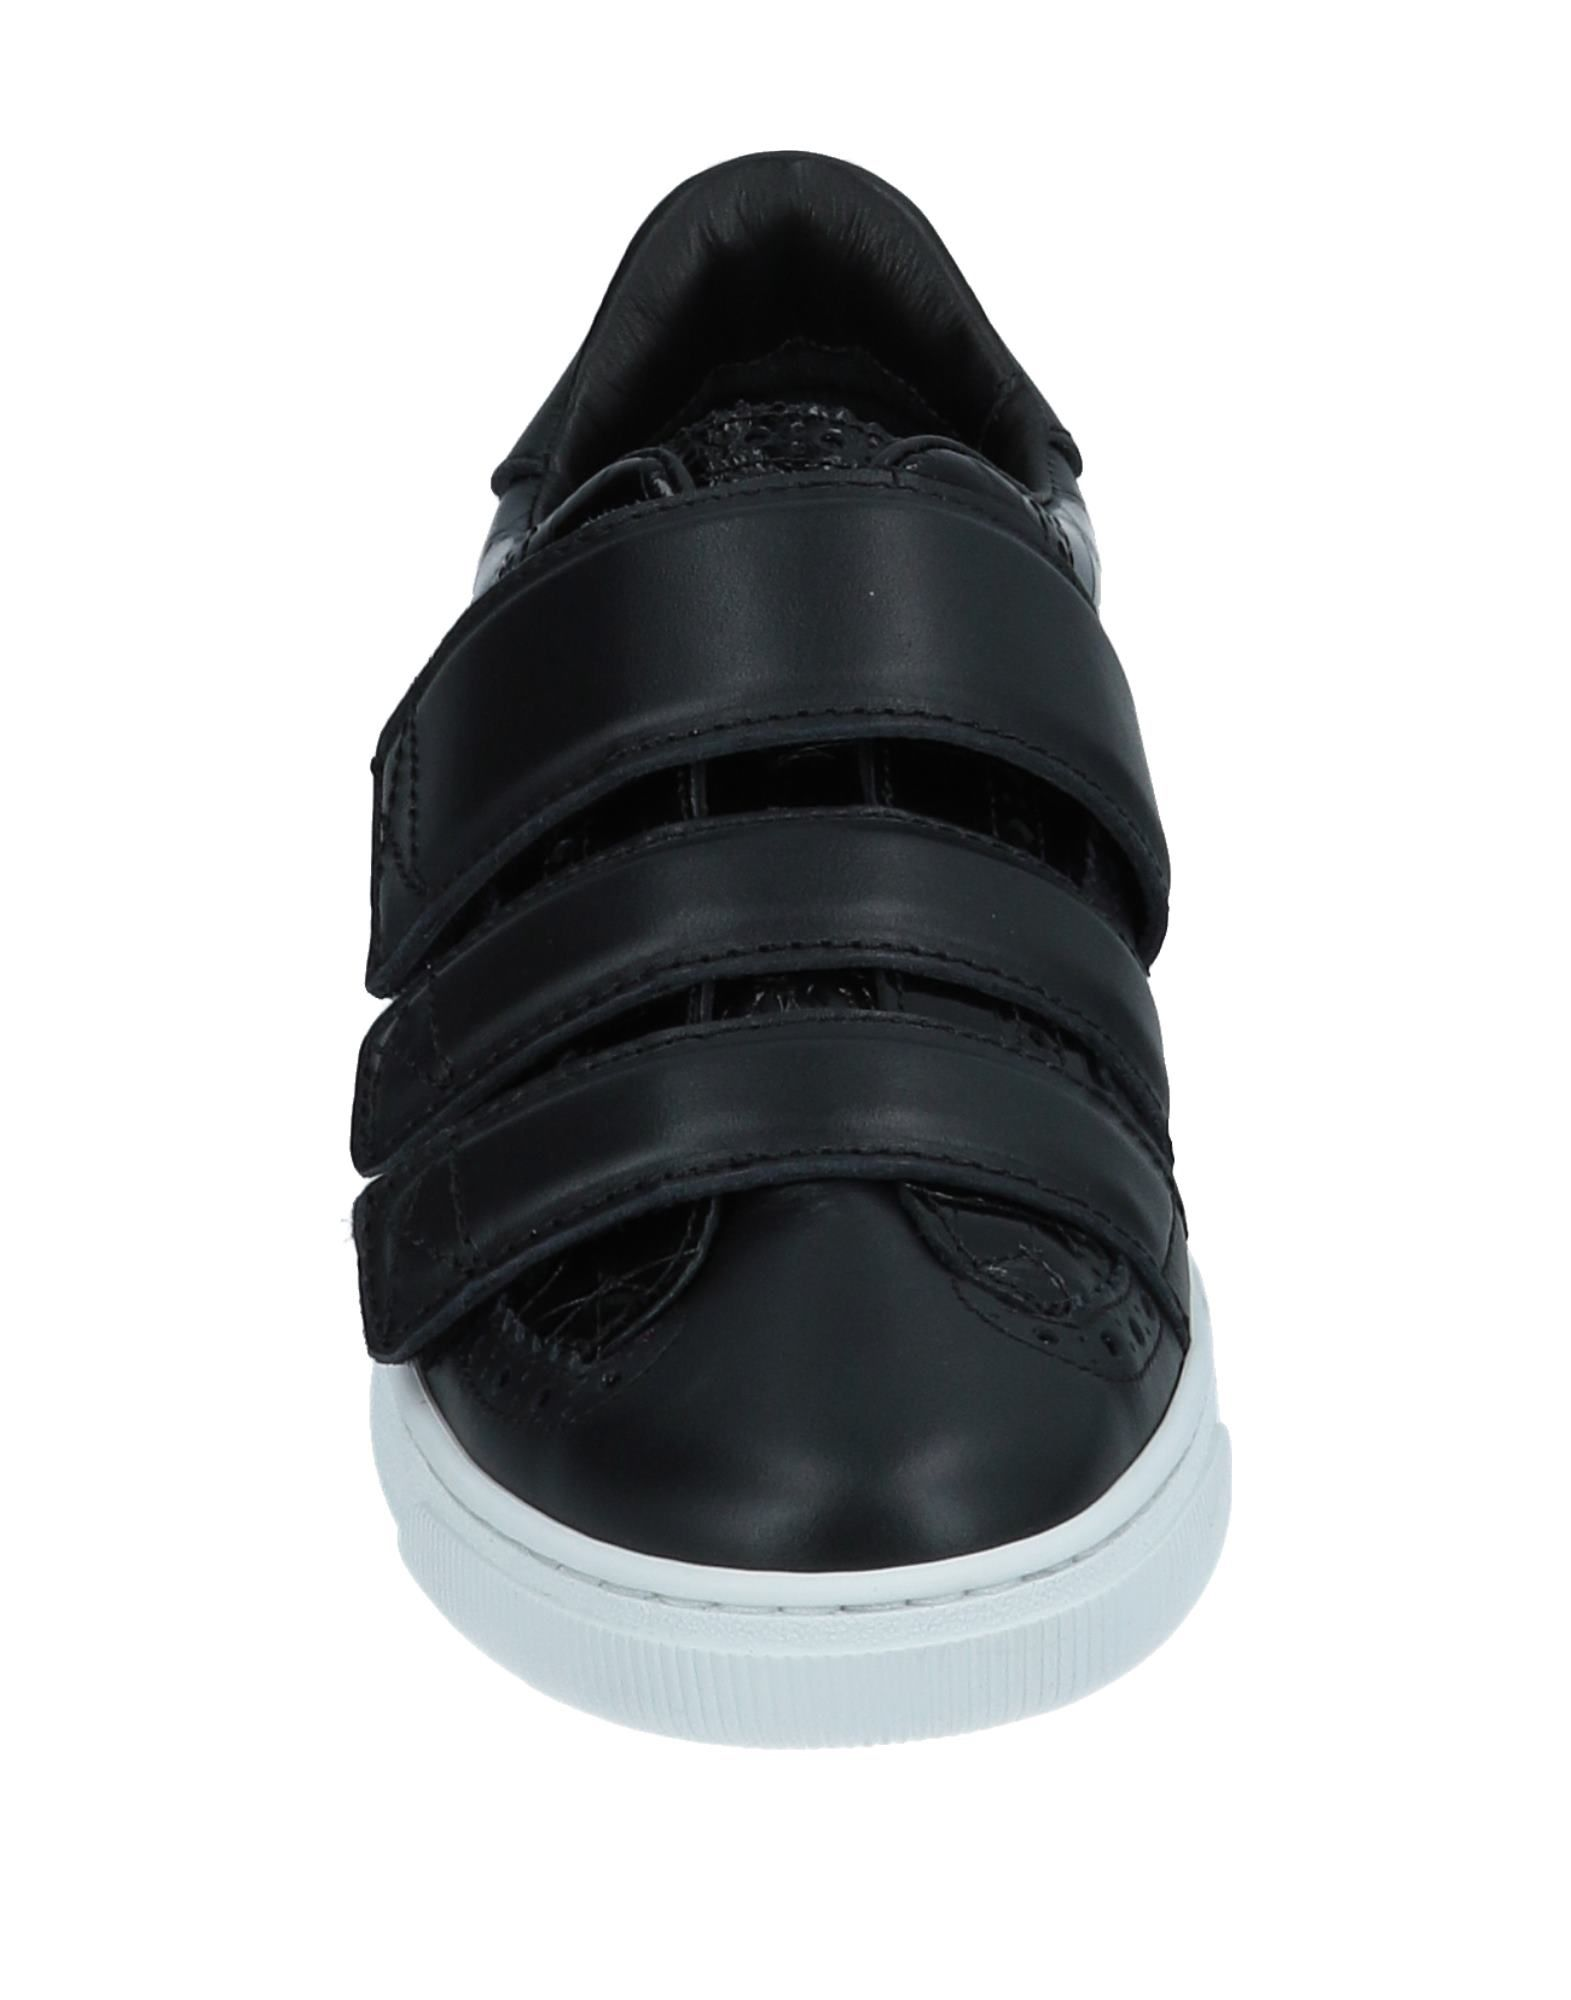 Rabatt Dsquared2 Schuhe Dsquared2 Rabatt Sneakers Damen  11555747UQ 06a629